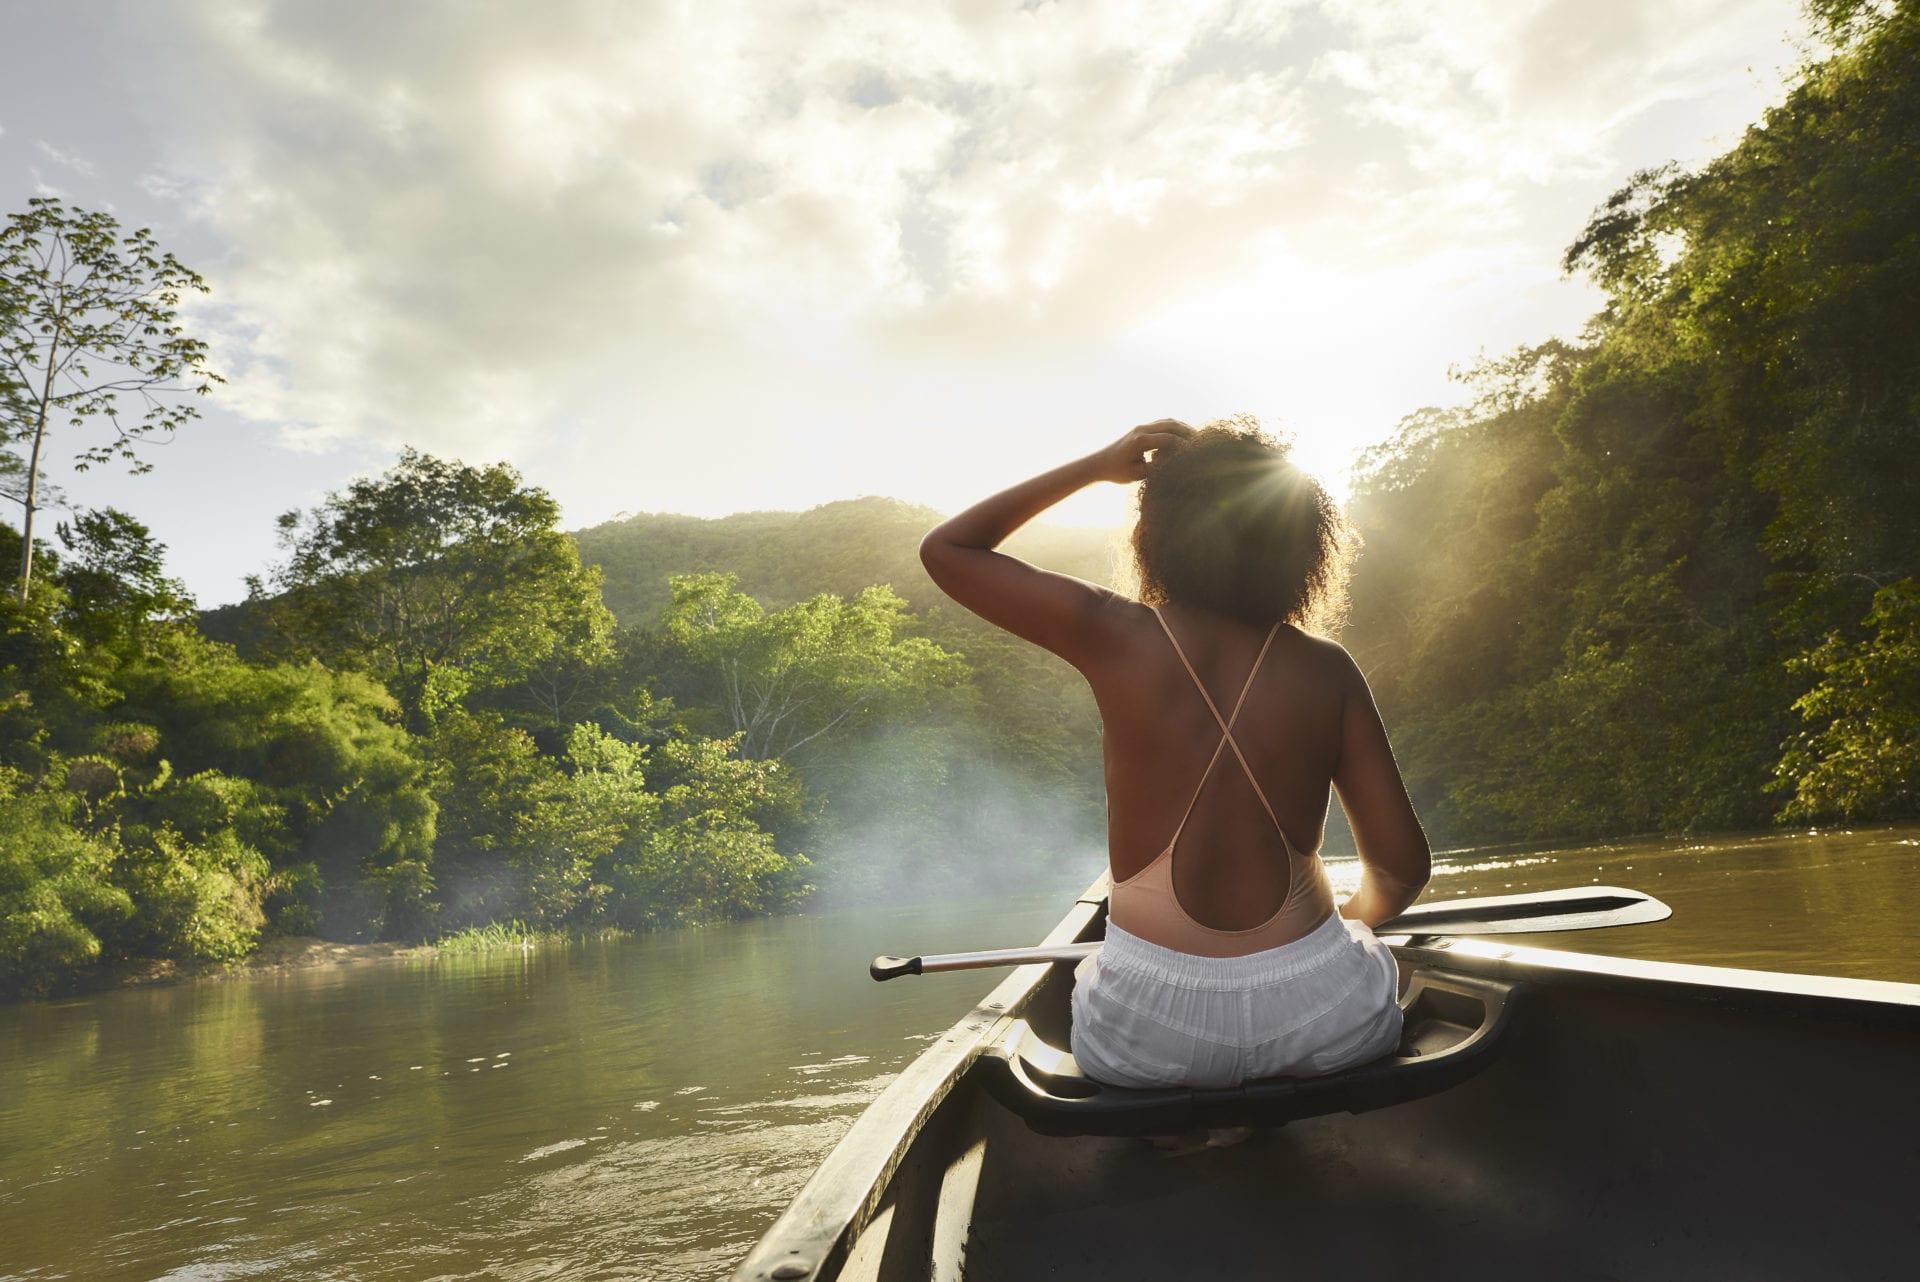 canoe ride in San Ignacio Macal River